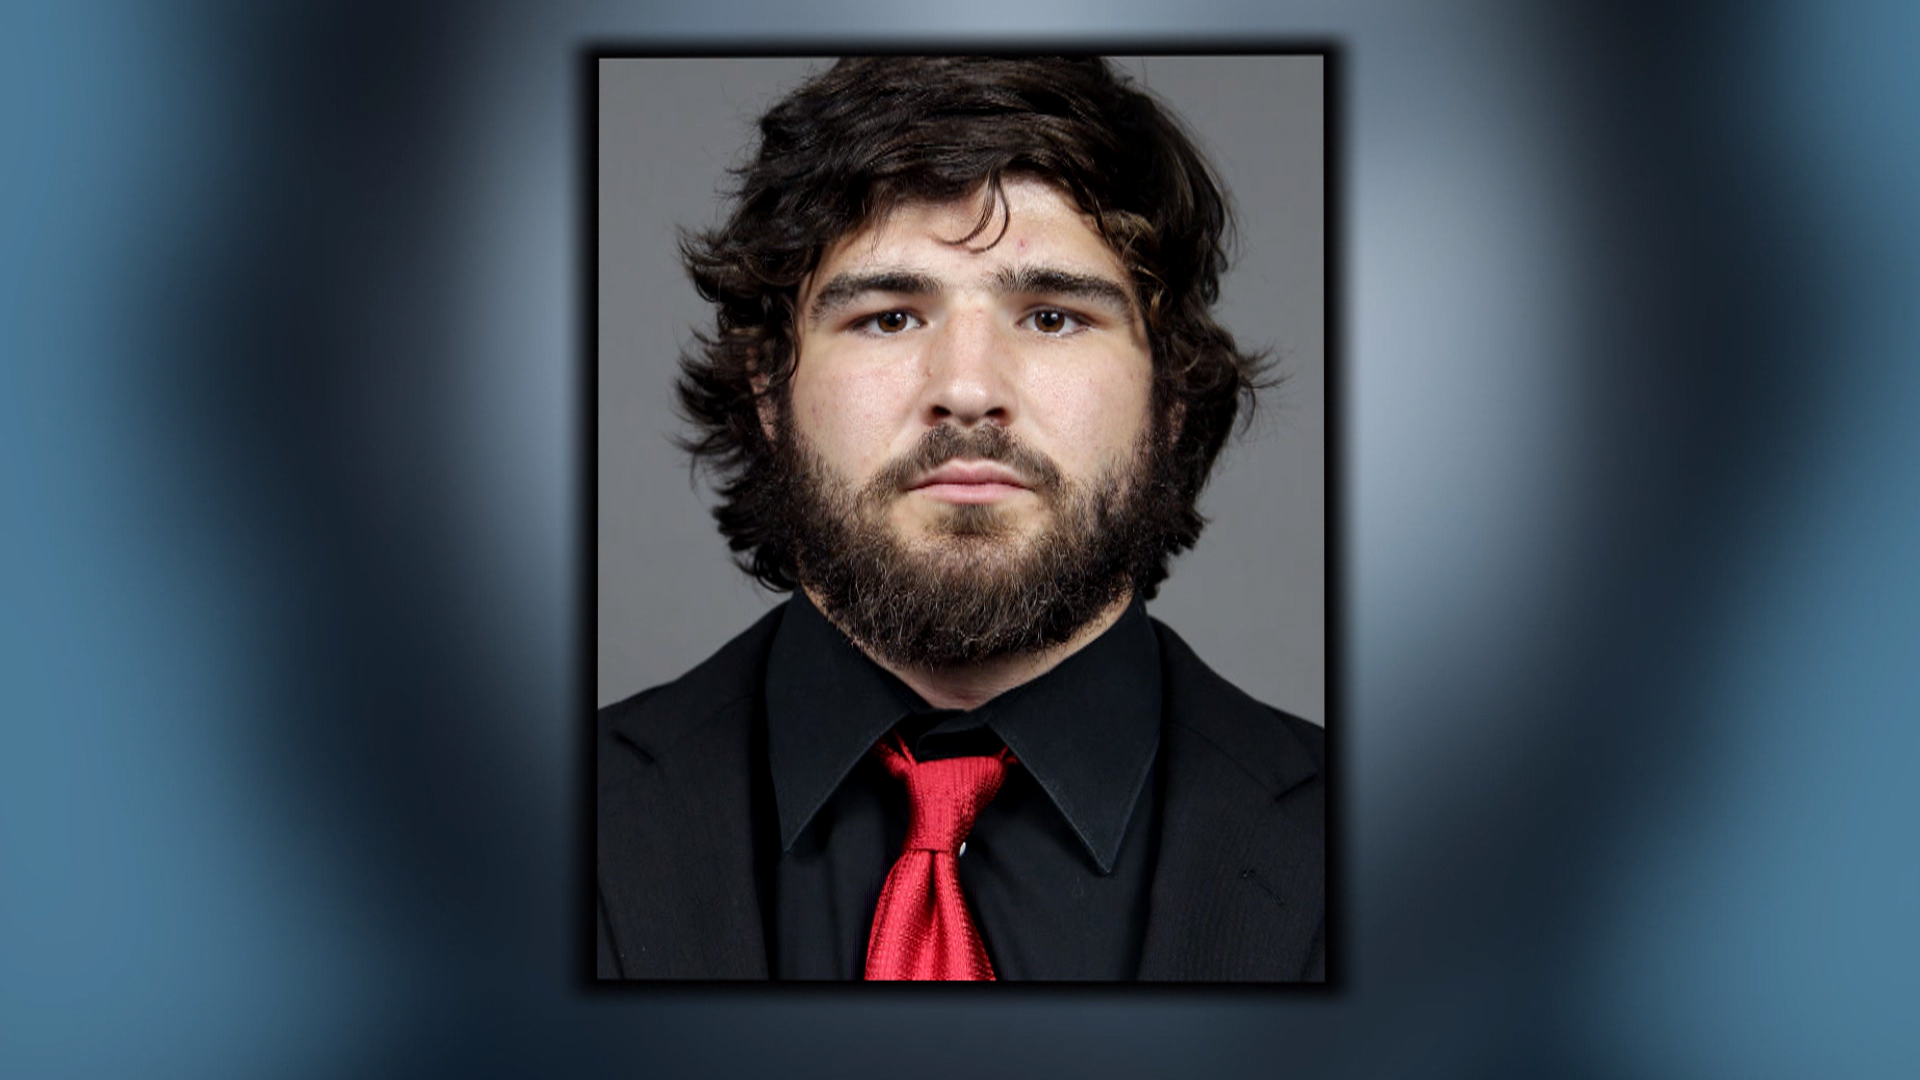 Ohio State University Football Player Kosta Karageorge Remains Missing